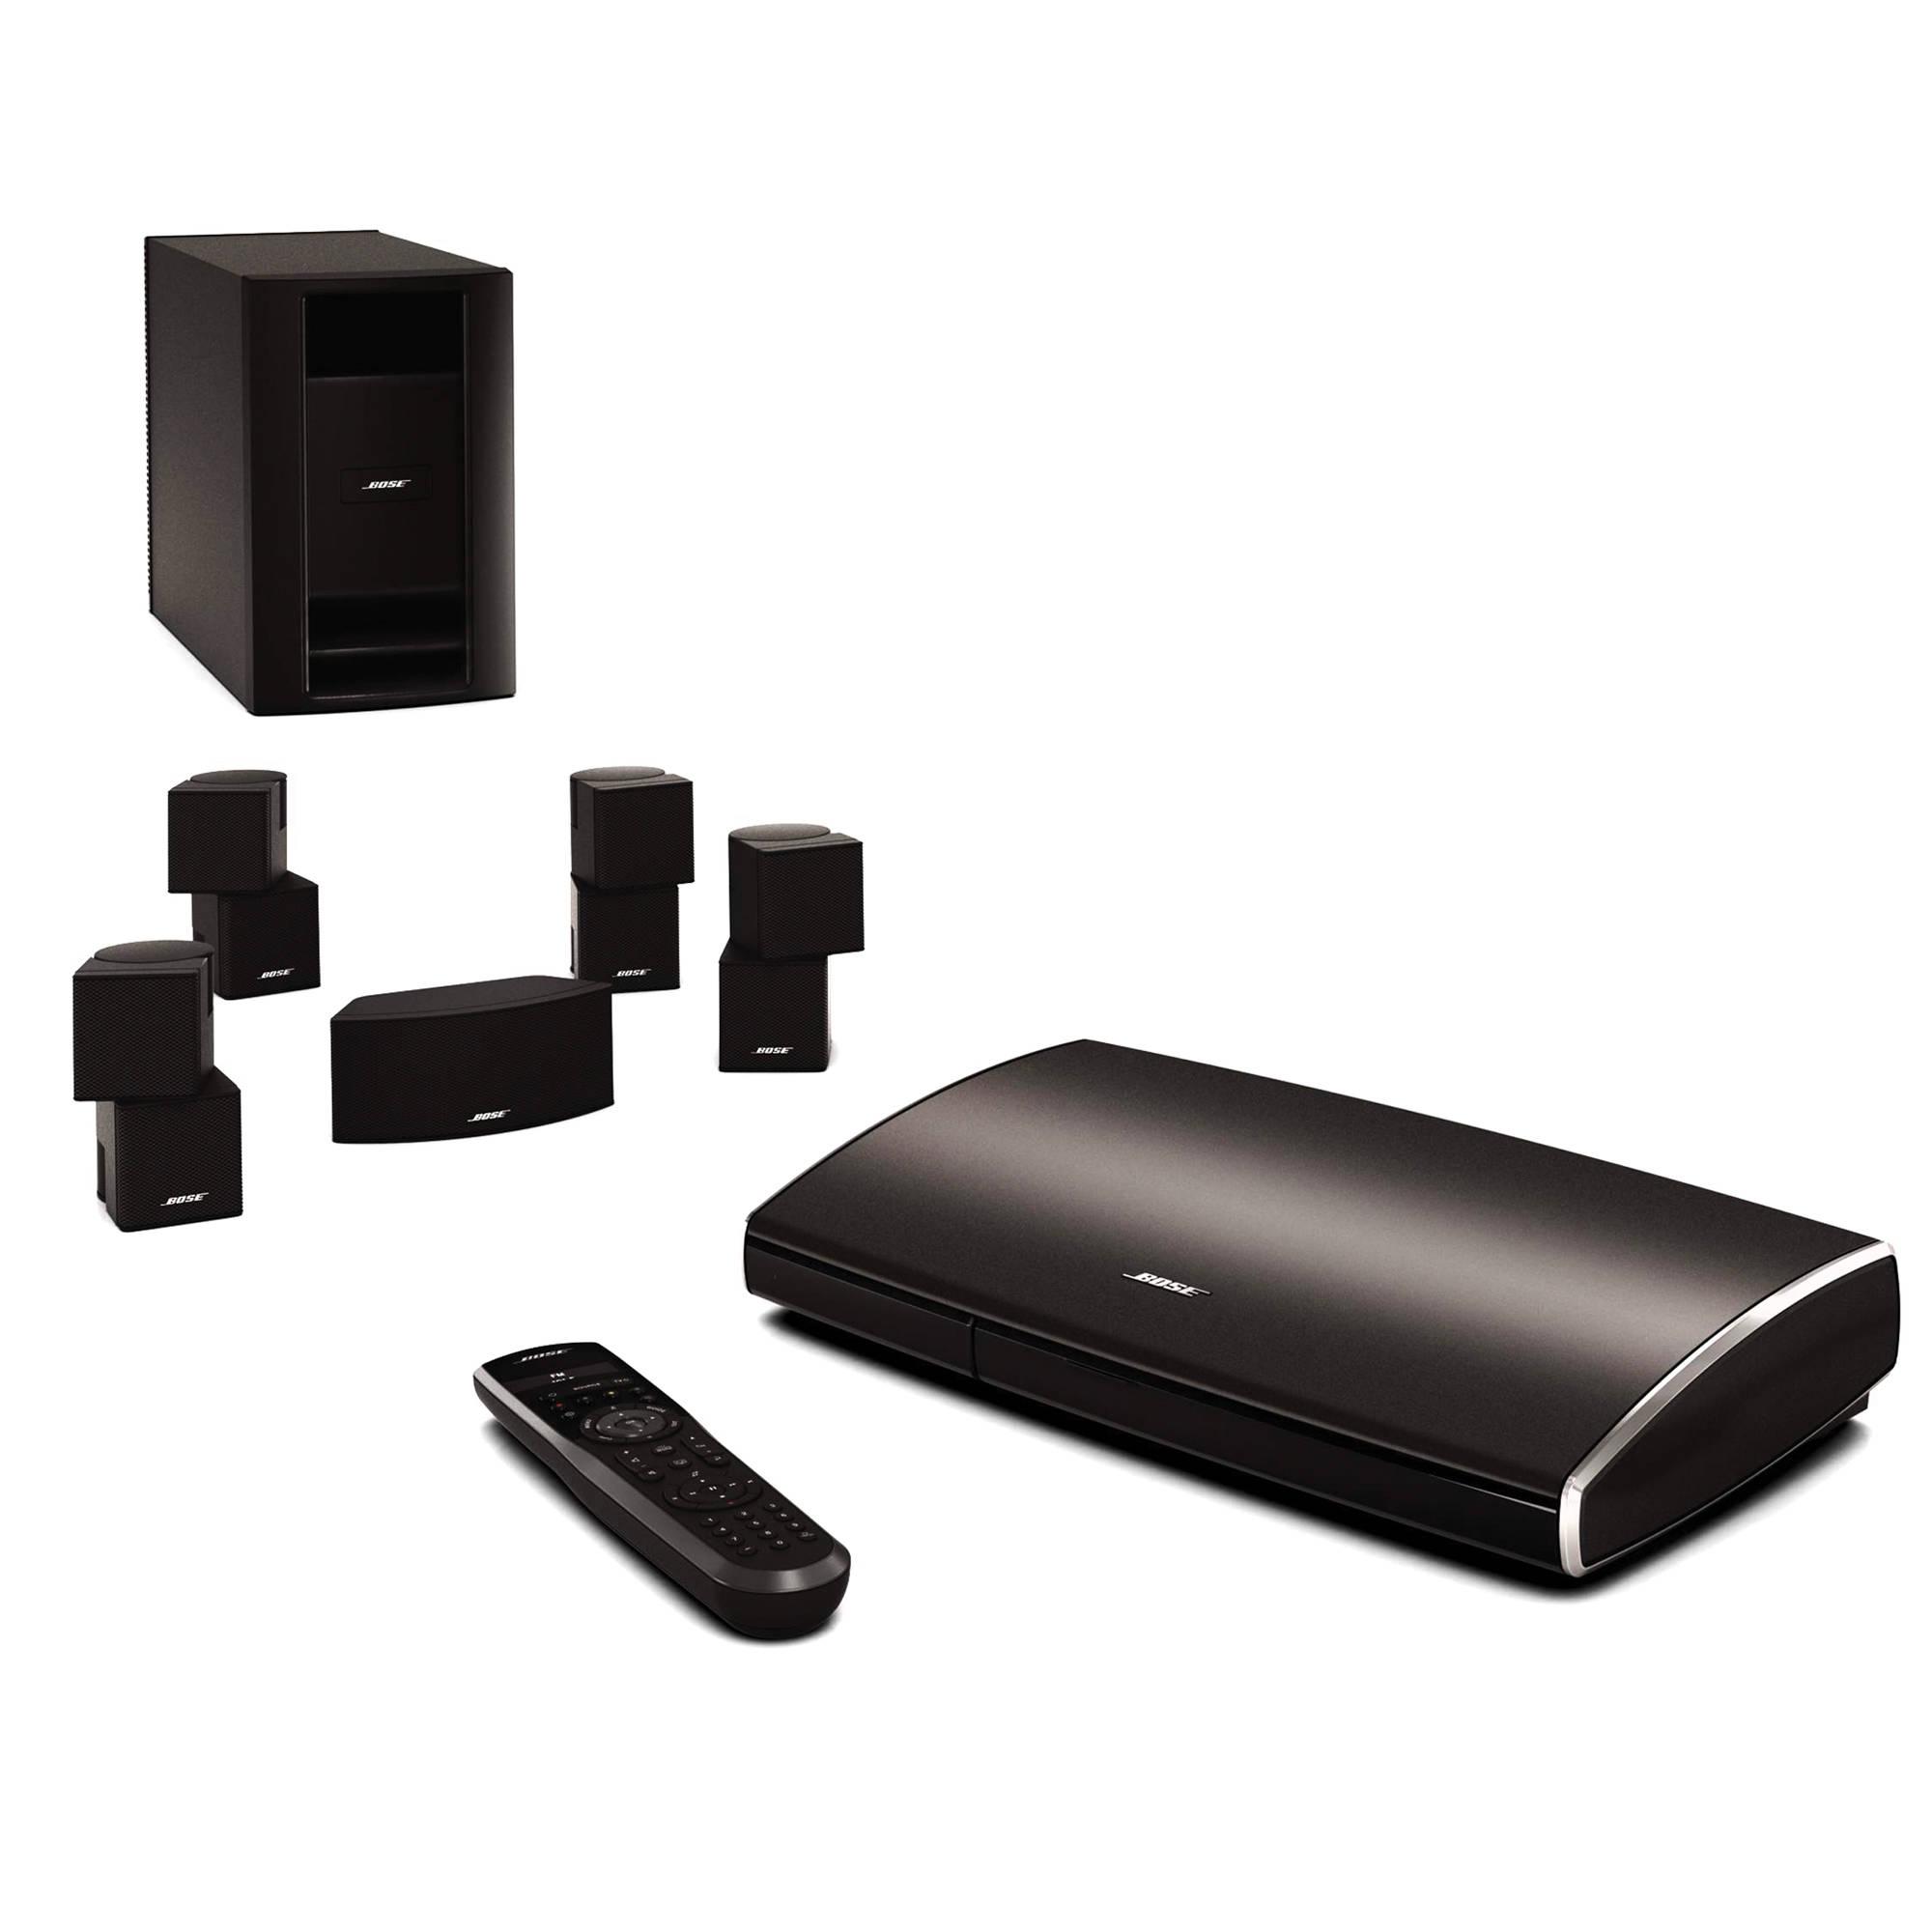 Bose Lifestyle 535 Series II Home Entertainment 363945-1100 B&HB&H Photo